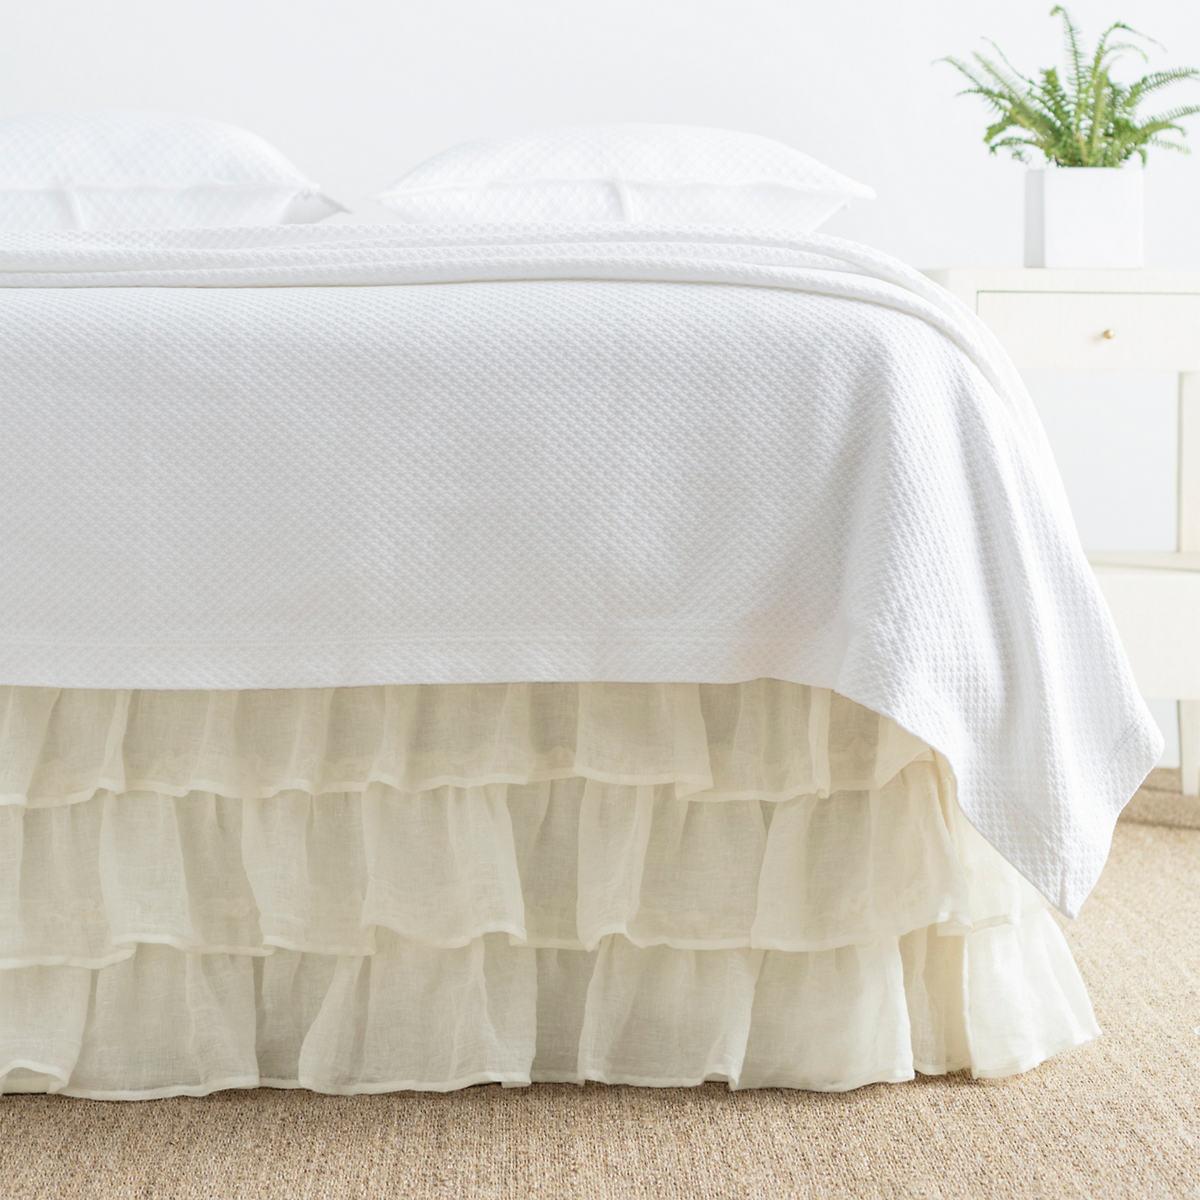 Savannah Linen Gauze Ivory Tier Ruffle Bed Skirt